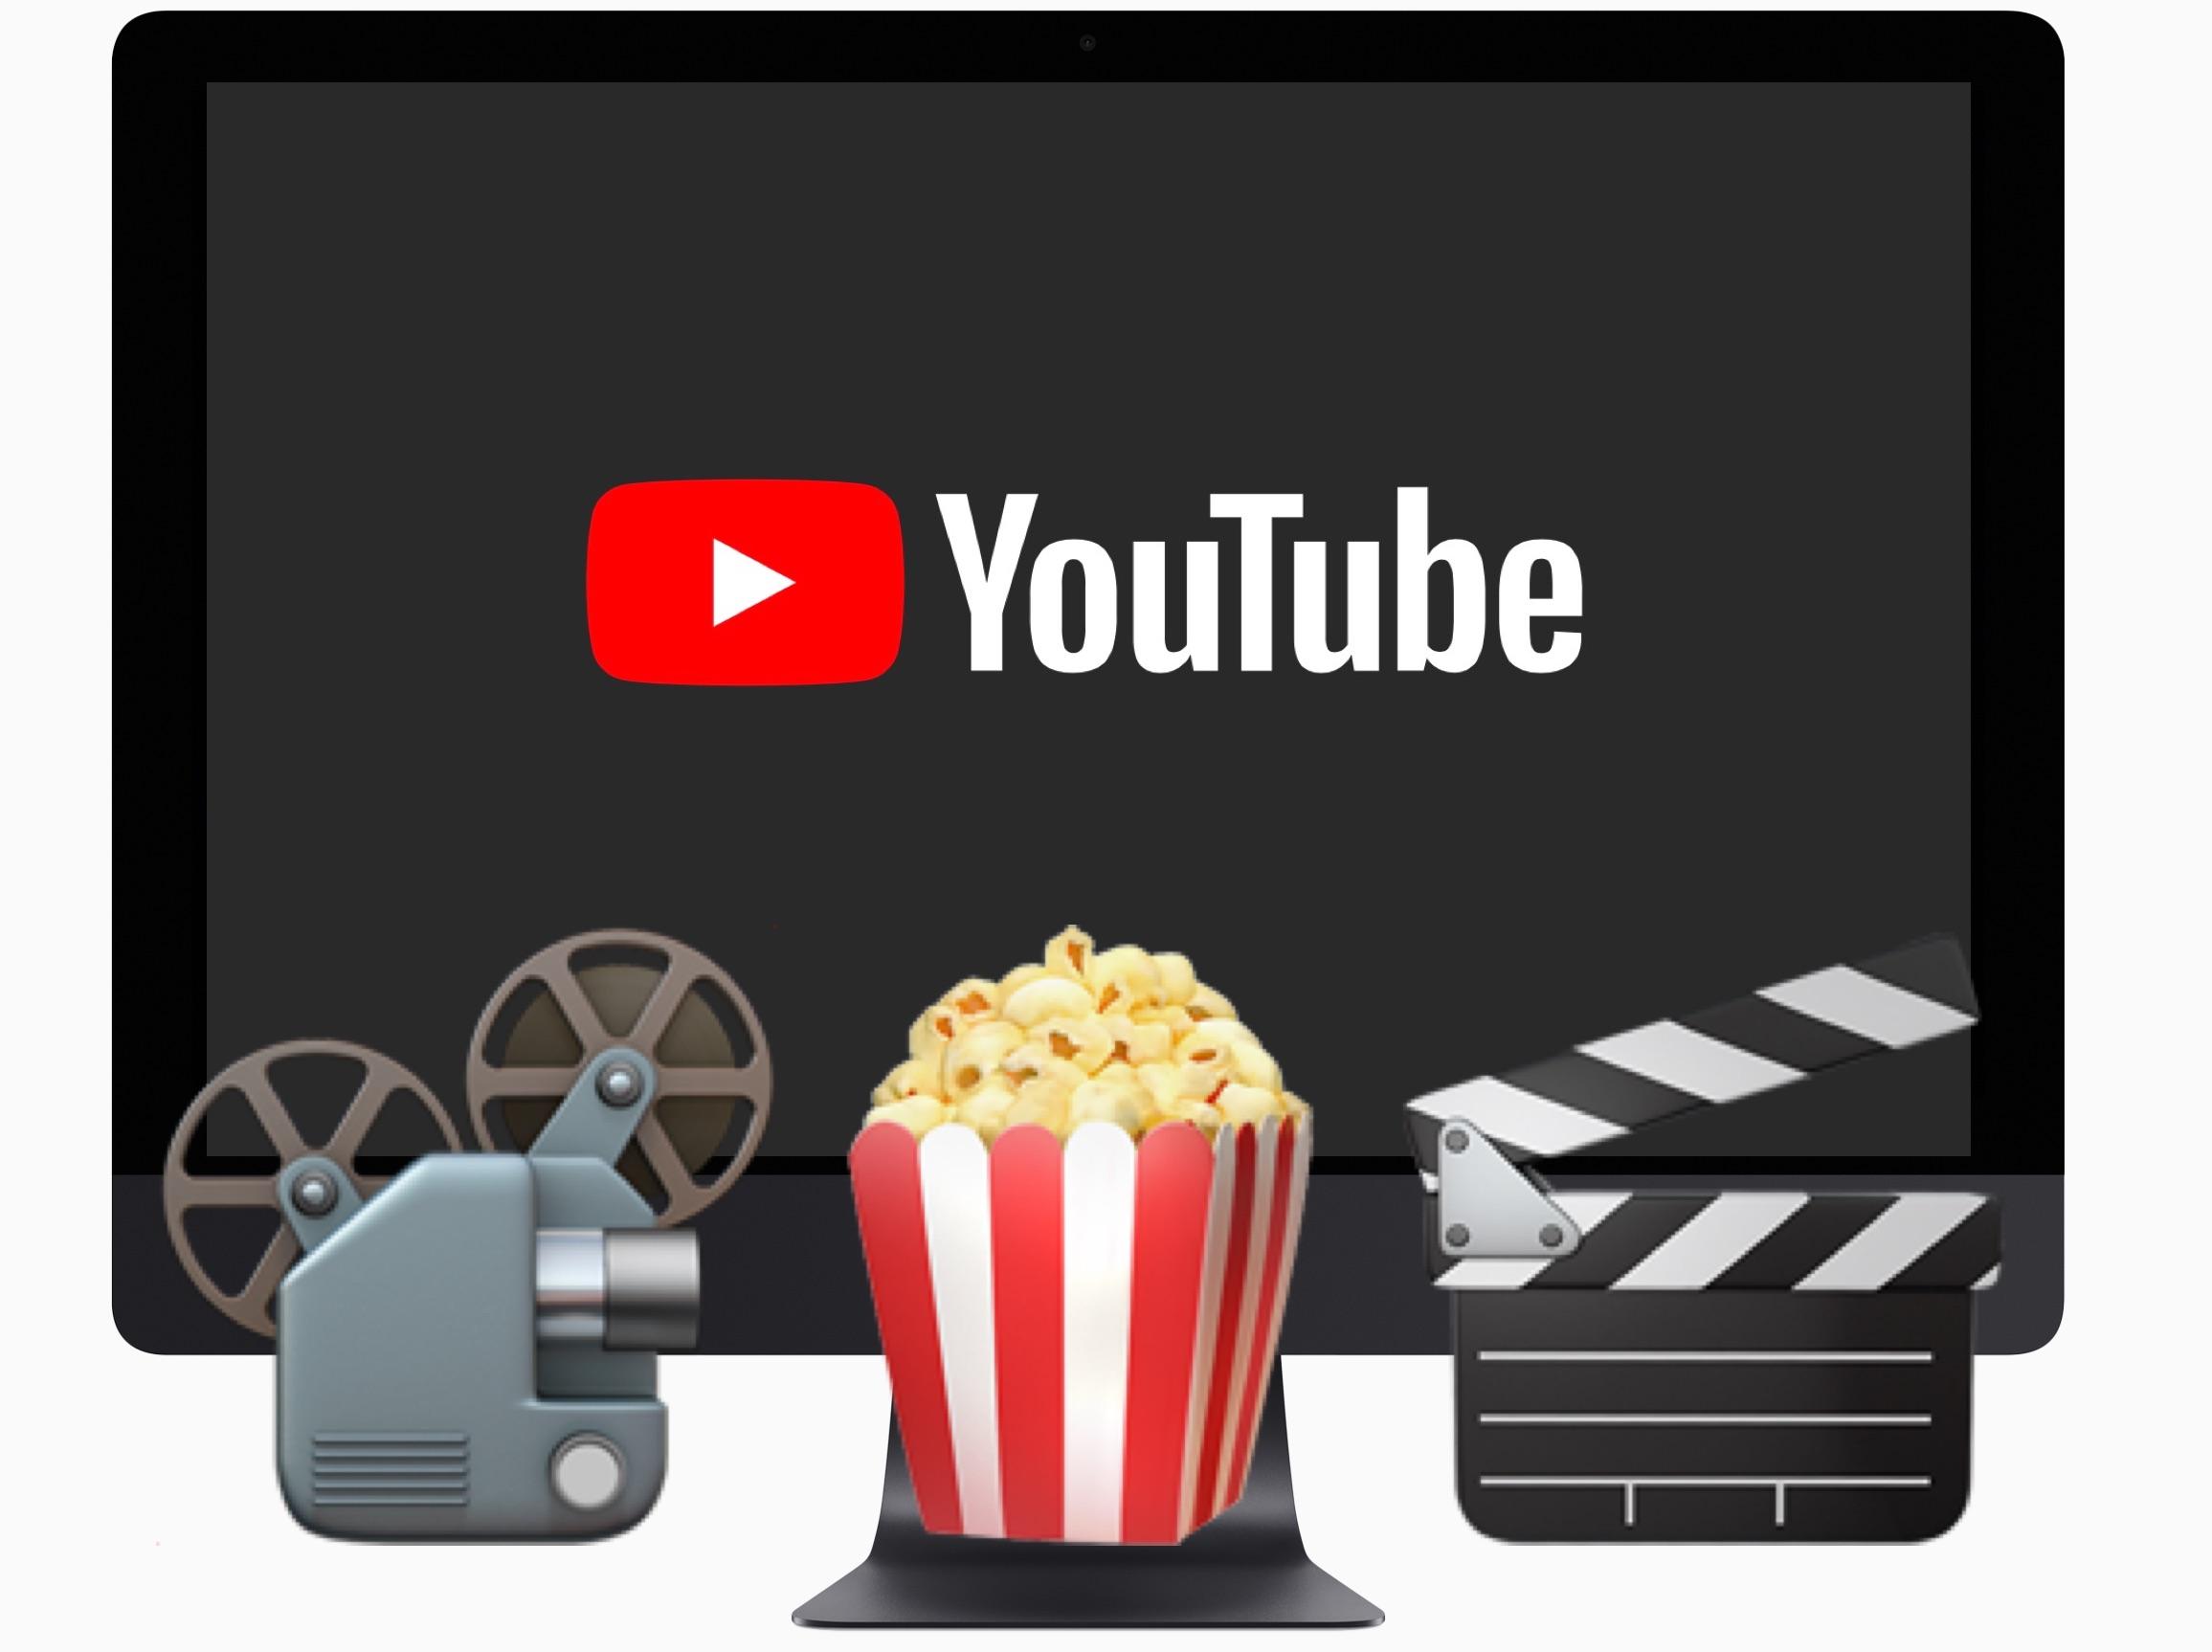 Total Videos | Watch Videos Online in 2020 | Halftime show